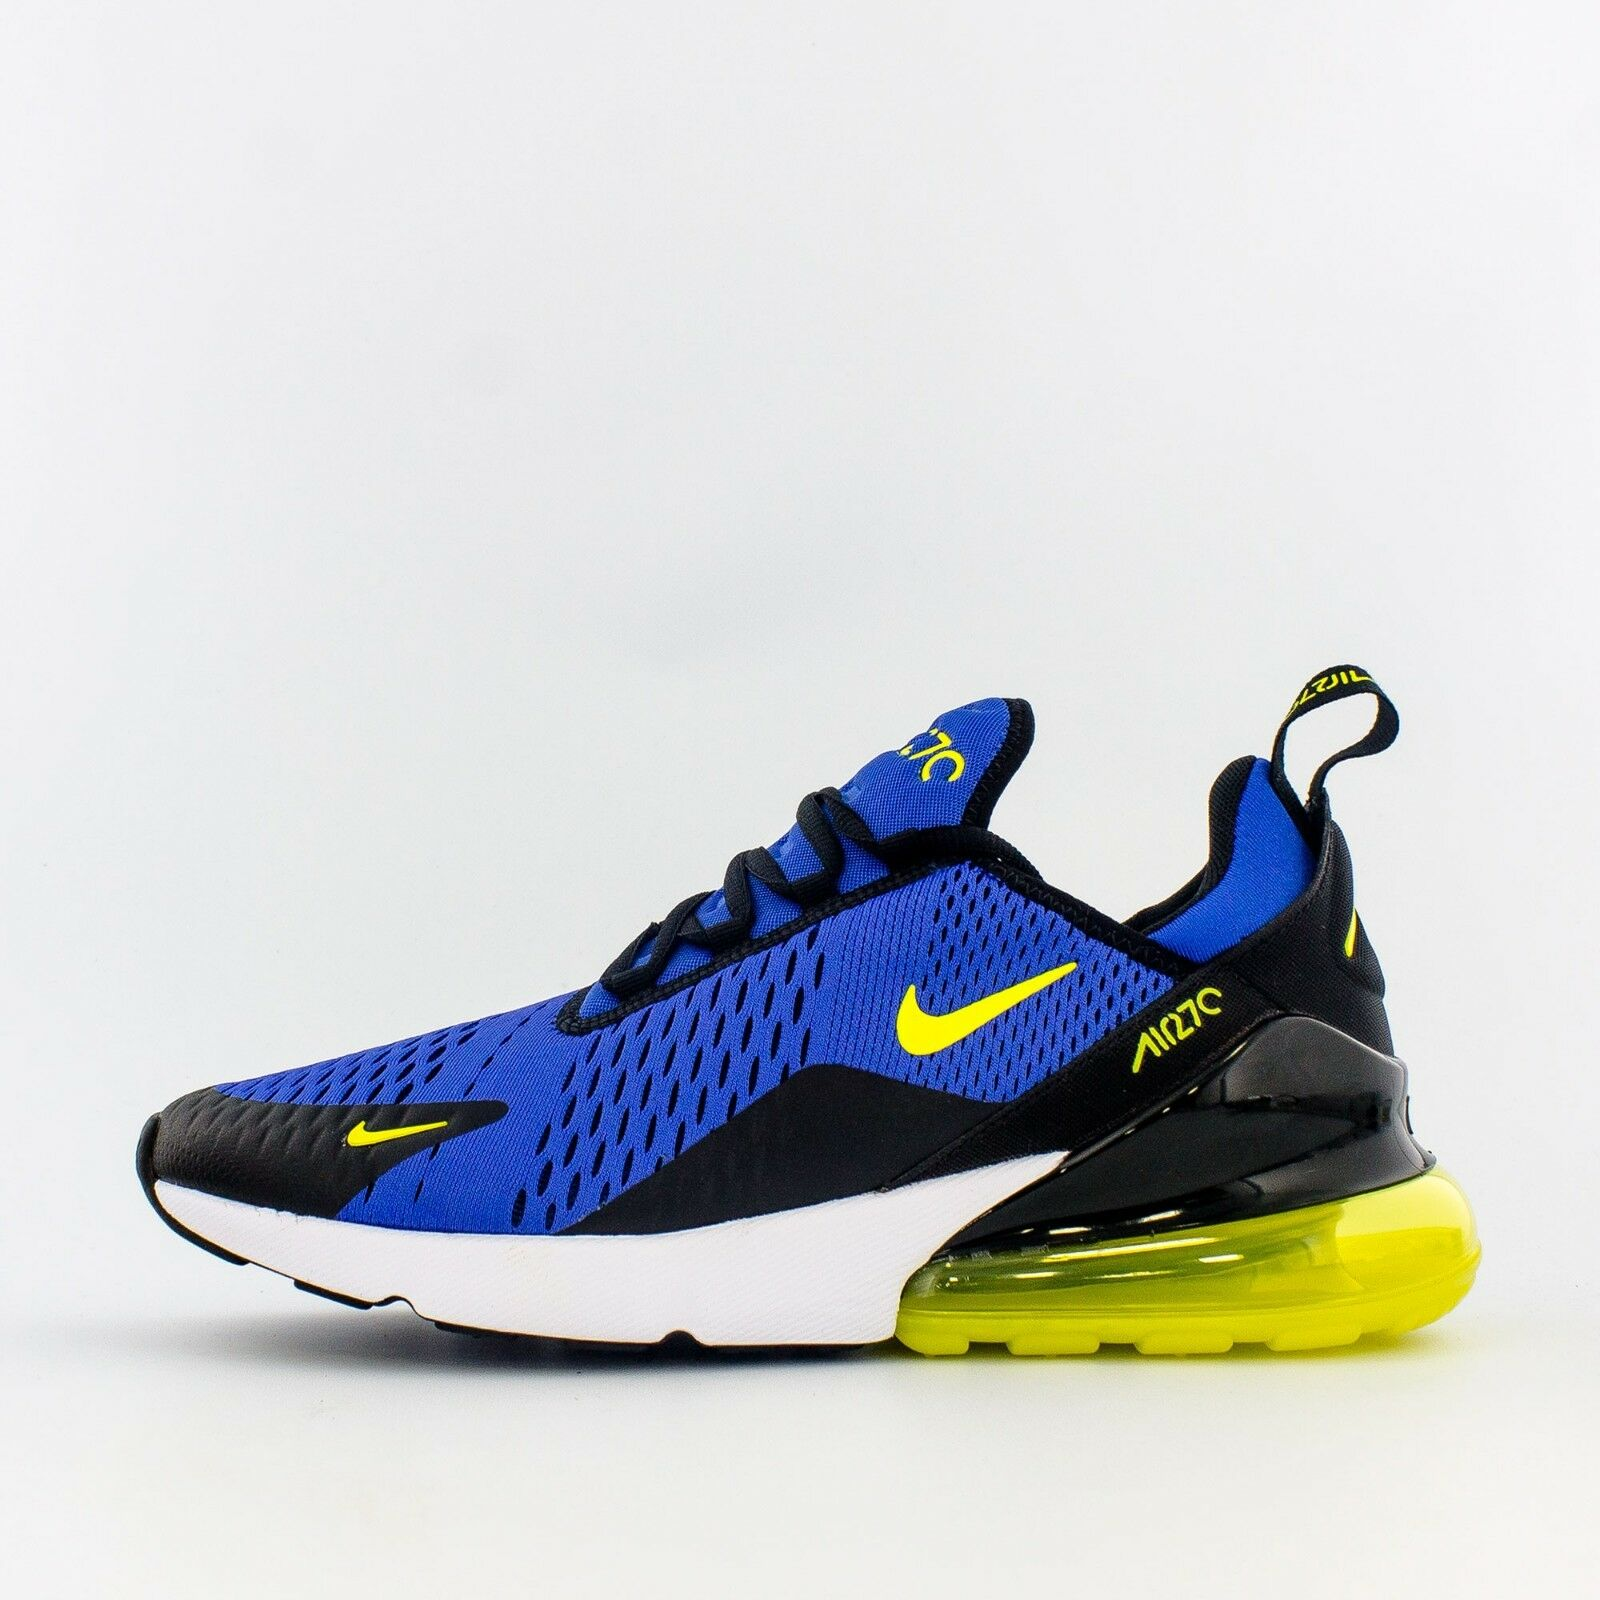 Nike Air Max 270 BV2517 400 Game Royal  -- Dynamic giallo Men SZ 7.5 - 13  tempo libero